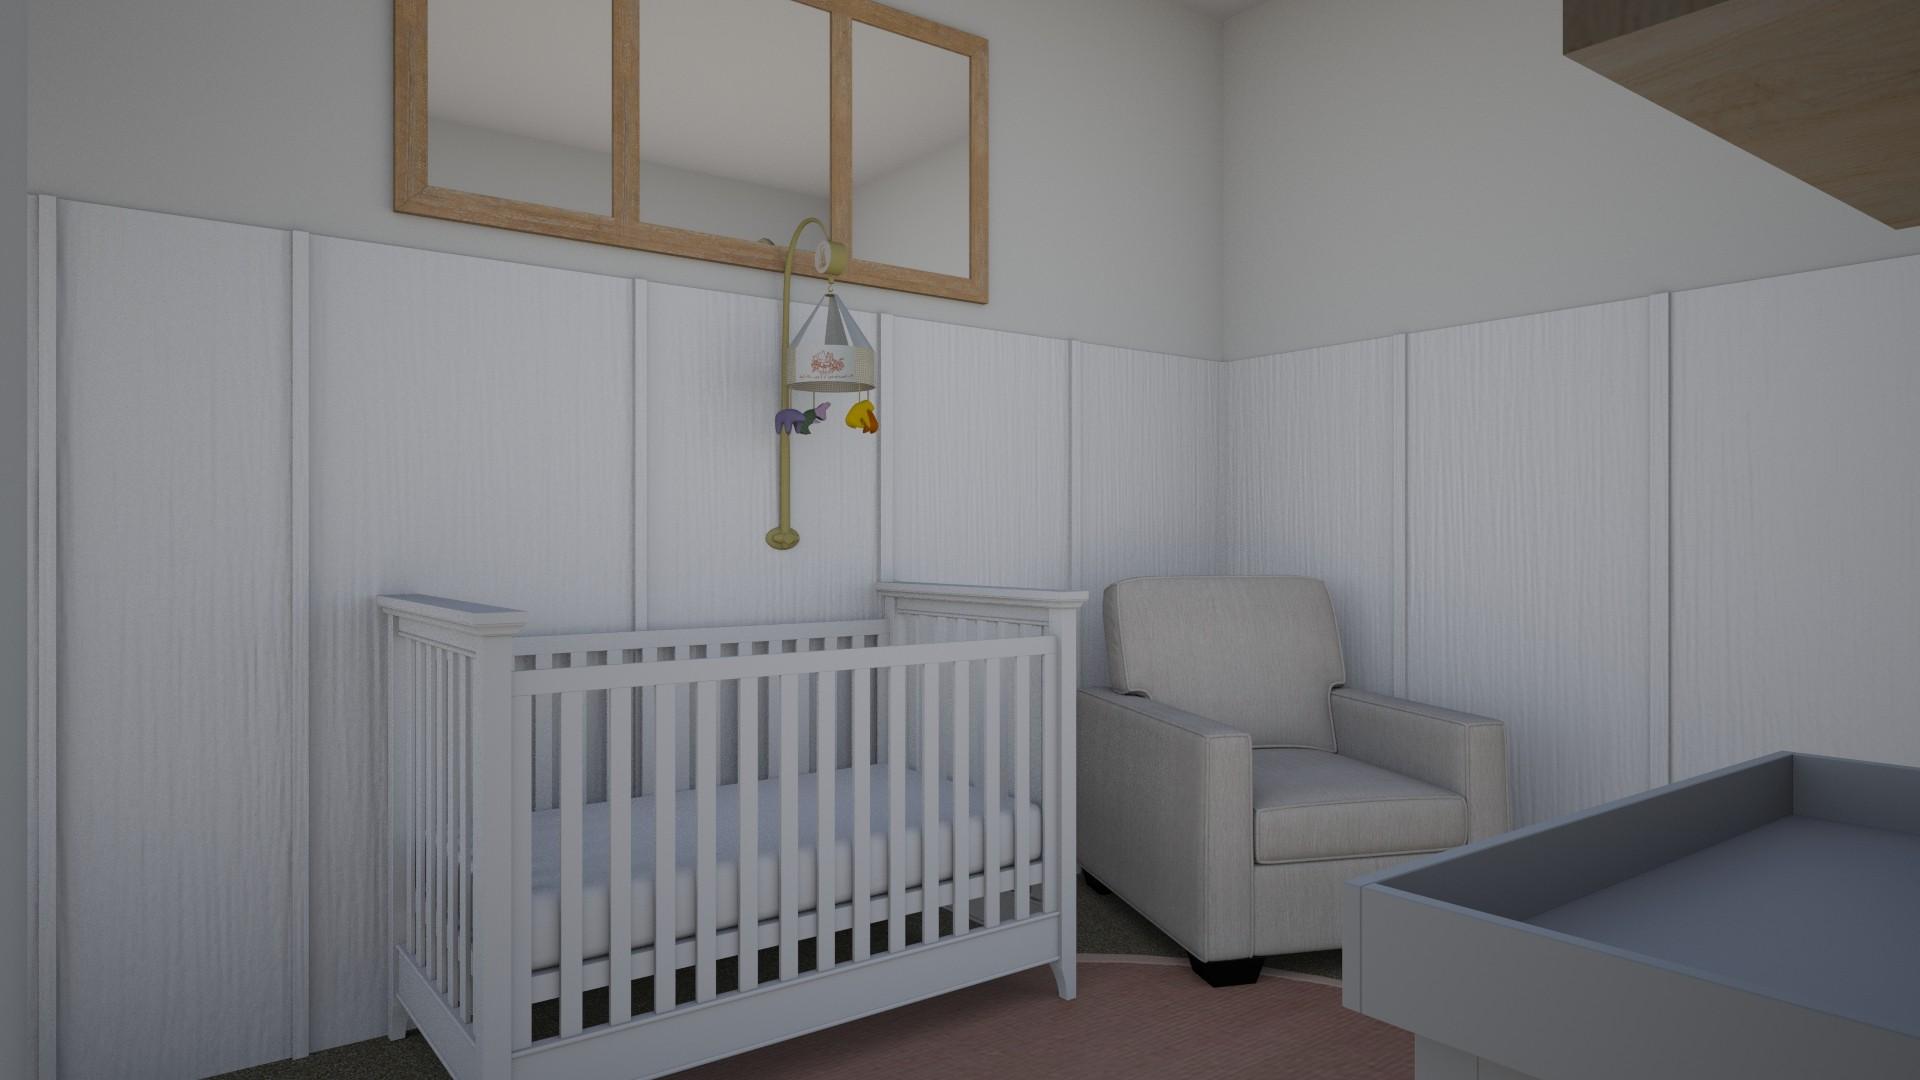 Jacks Nursery  - by danielapeinemann